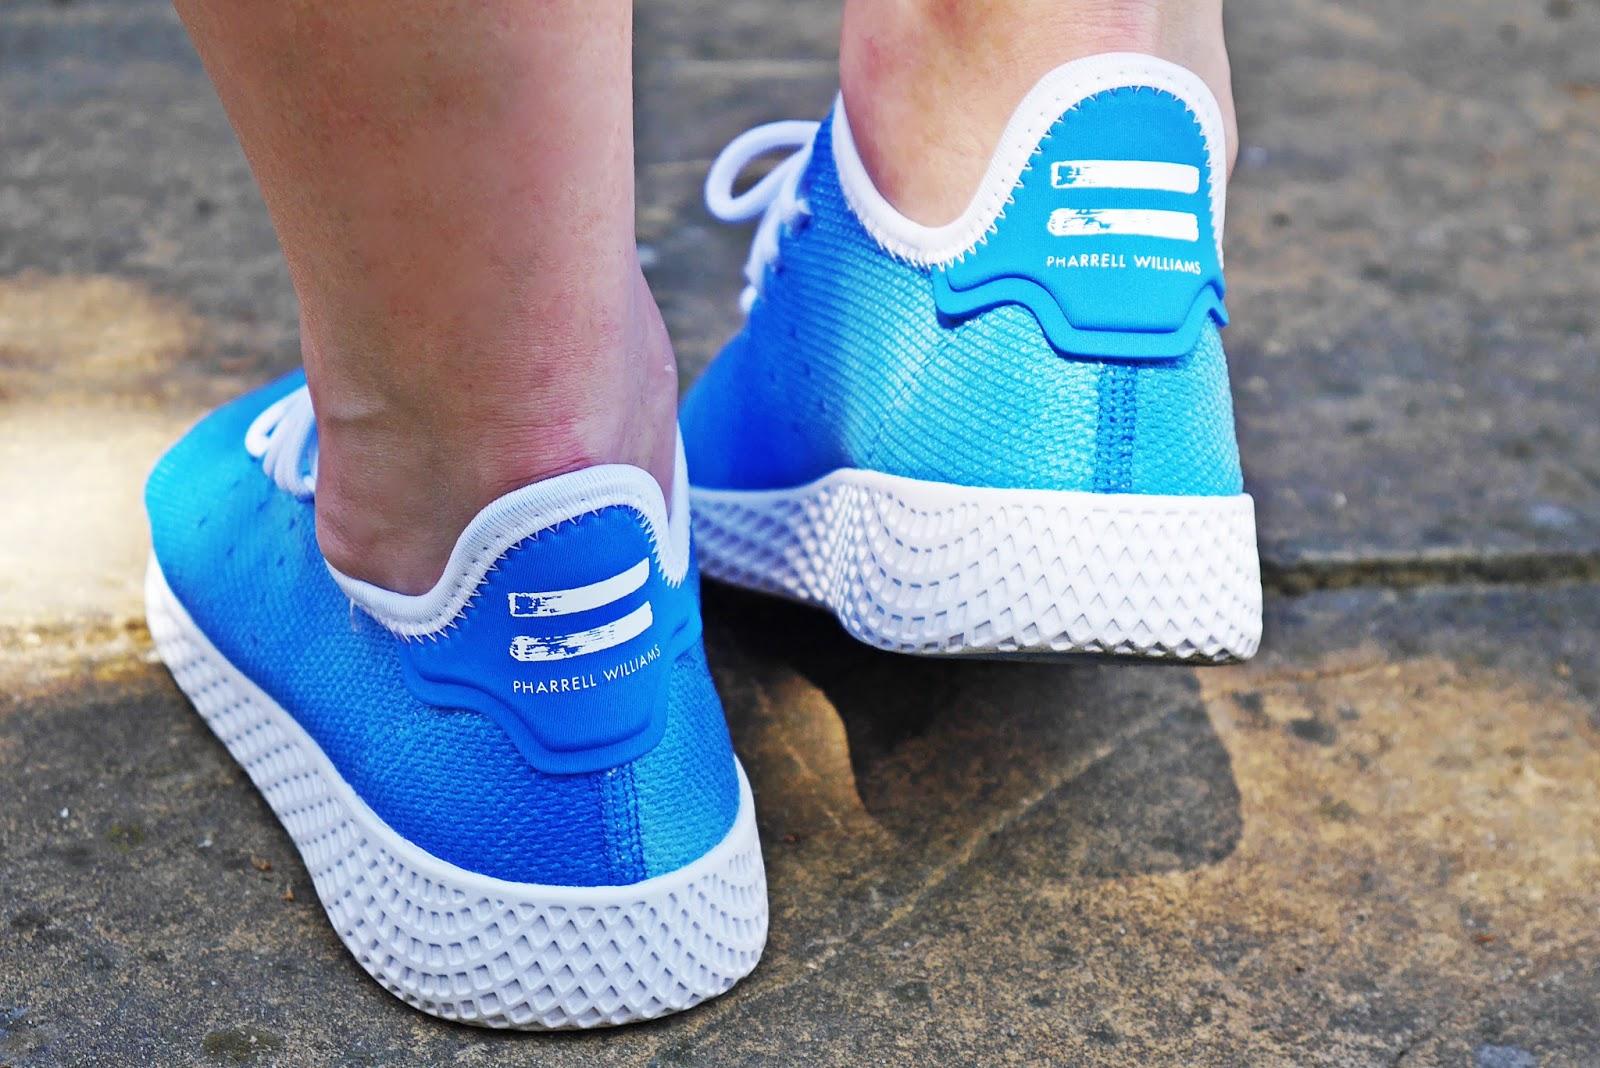 3_footway_adidas_pharell_williams_holi_hu_tennis_blue_sukienka_koronkowa-jeansowa_kurtka_140518